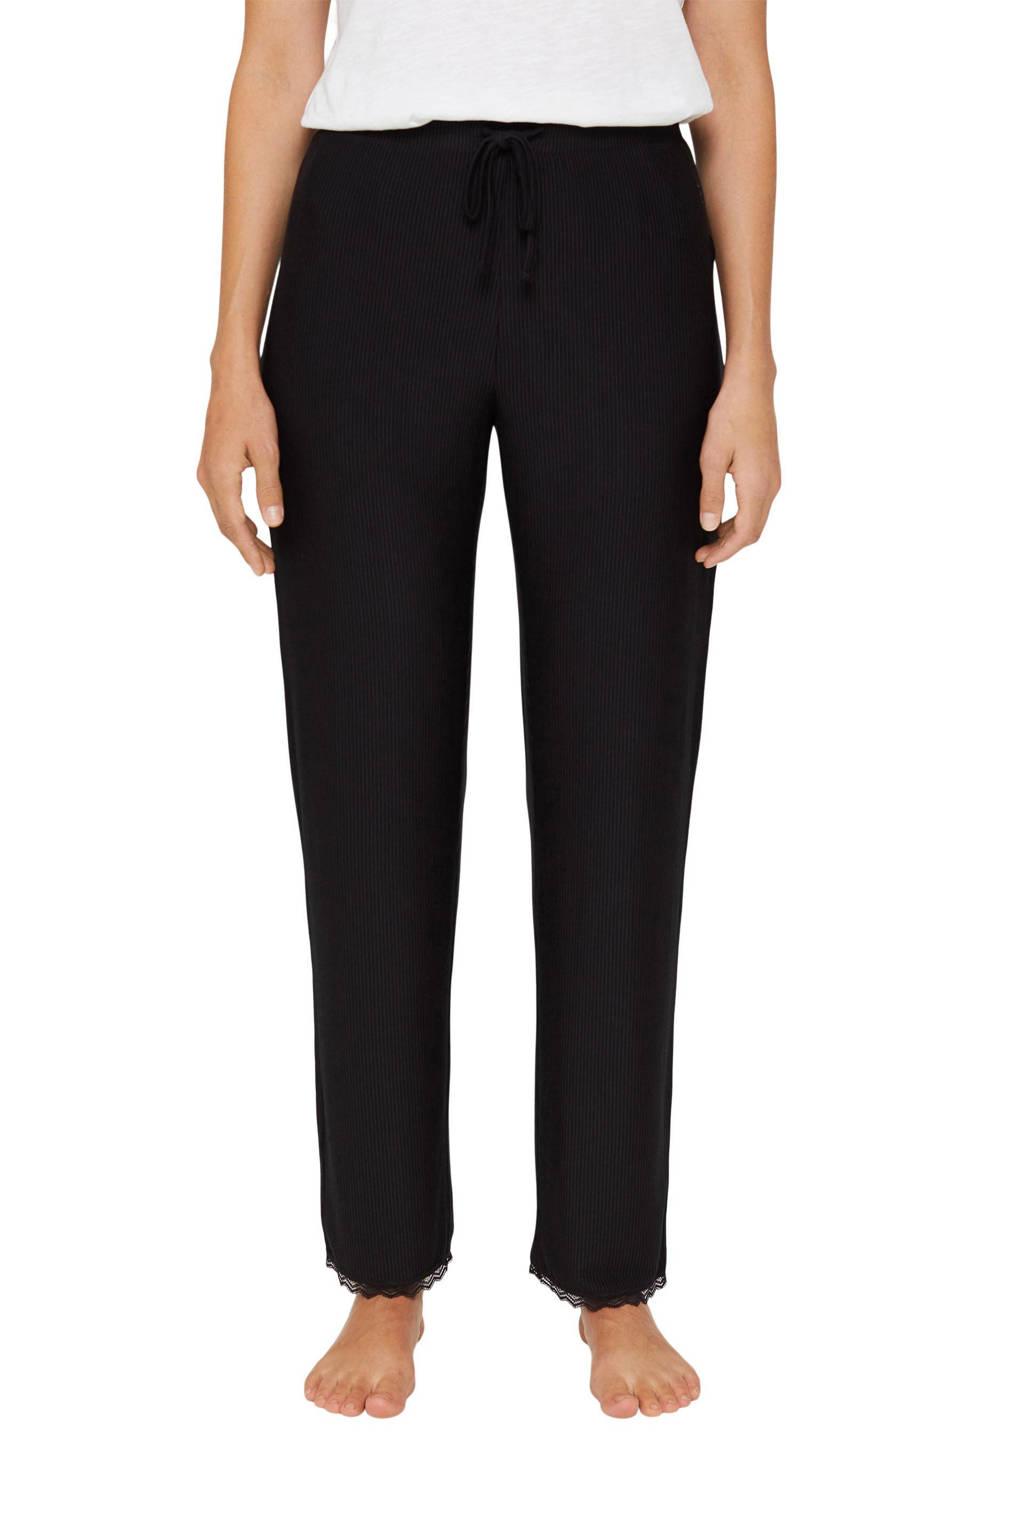 ESPRIT Women Bodywear pyjamabroek zwart, Zwart